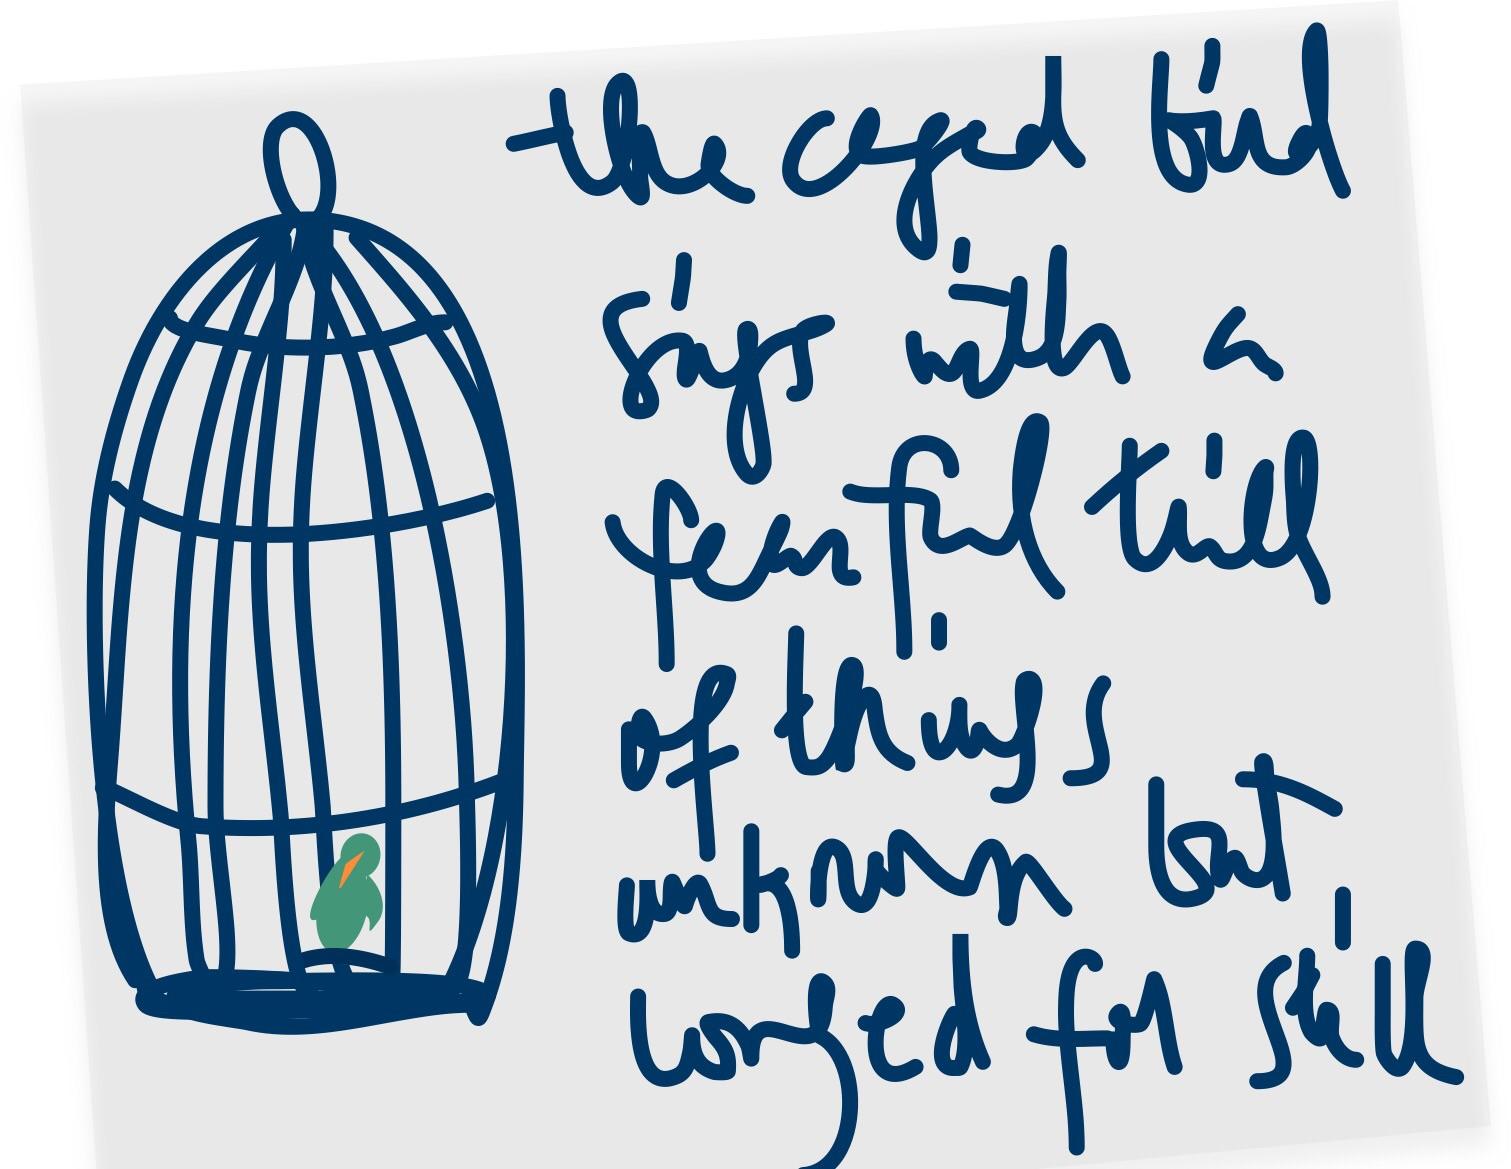 Essay On Caged Bird By Maya Angelou